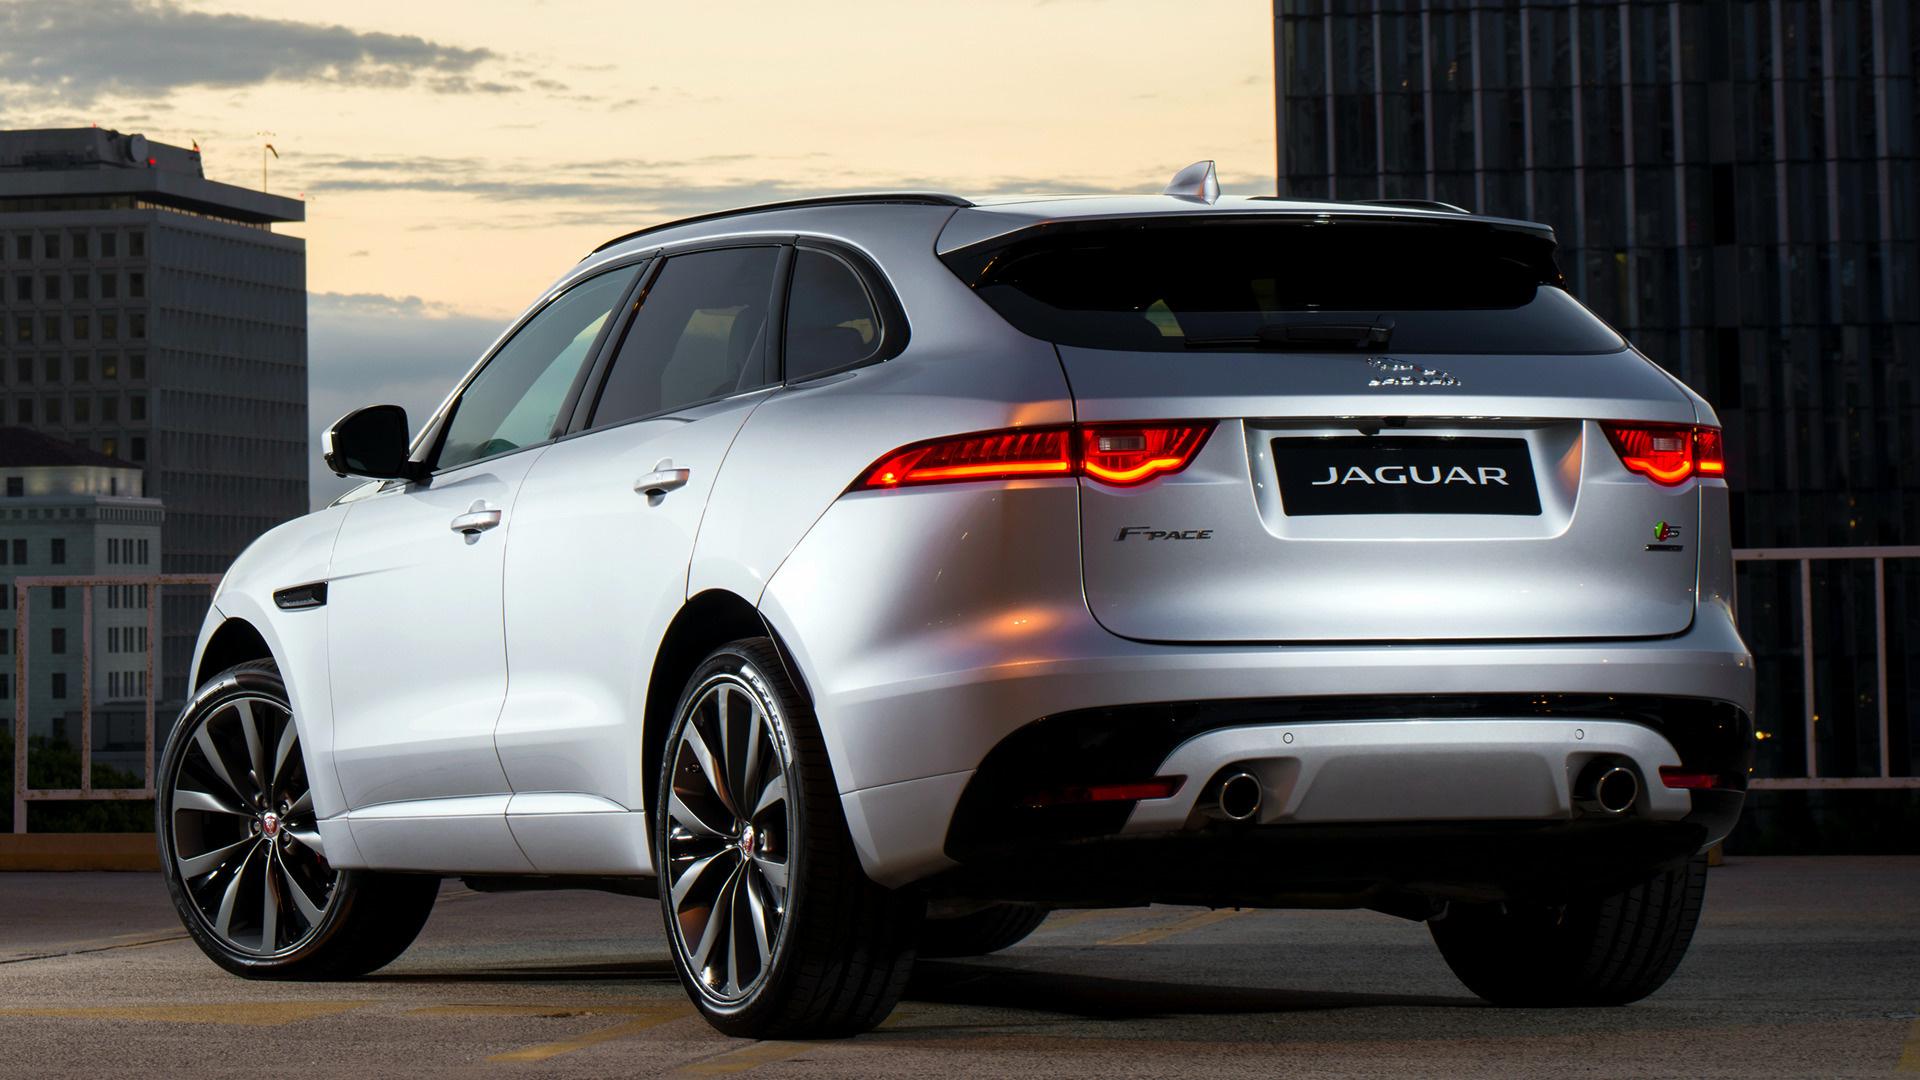 2017 Dodge Ram >> 2017 Jaguar F-Pace S (US) - Wallpapers and HD Images | Car ...